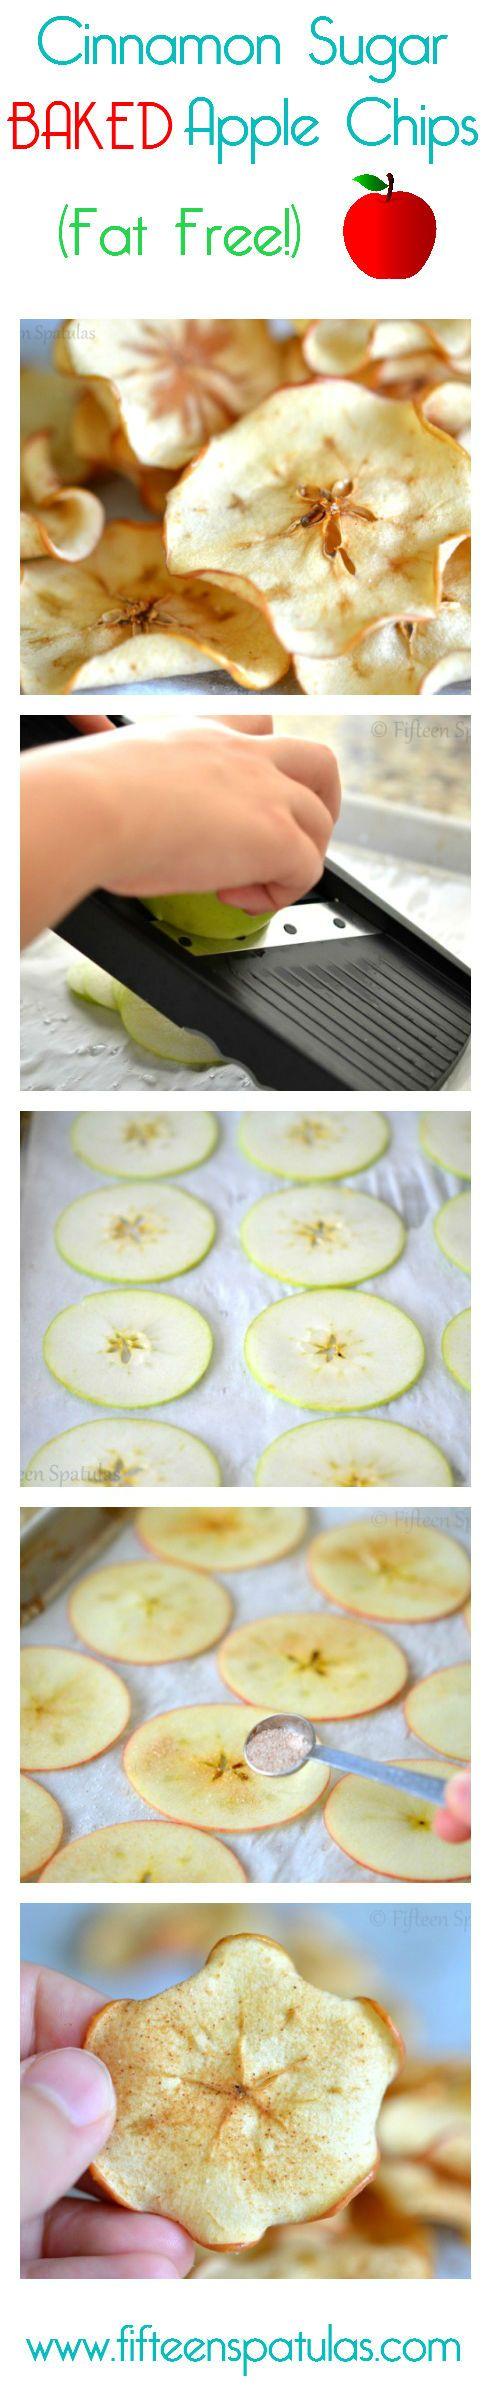 Baked Cinnamon Sugar Apple Chips {Fat Free Recipe}